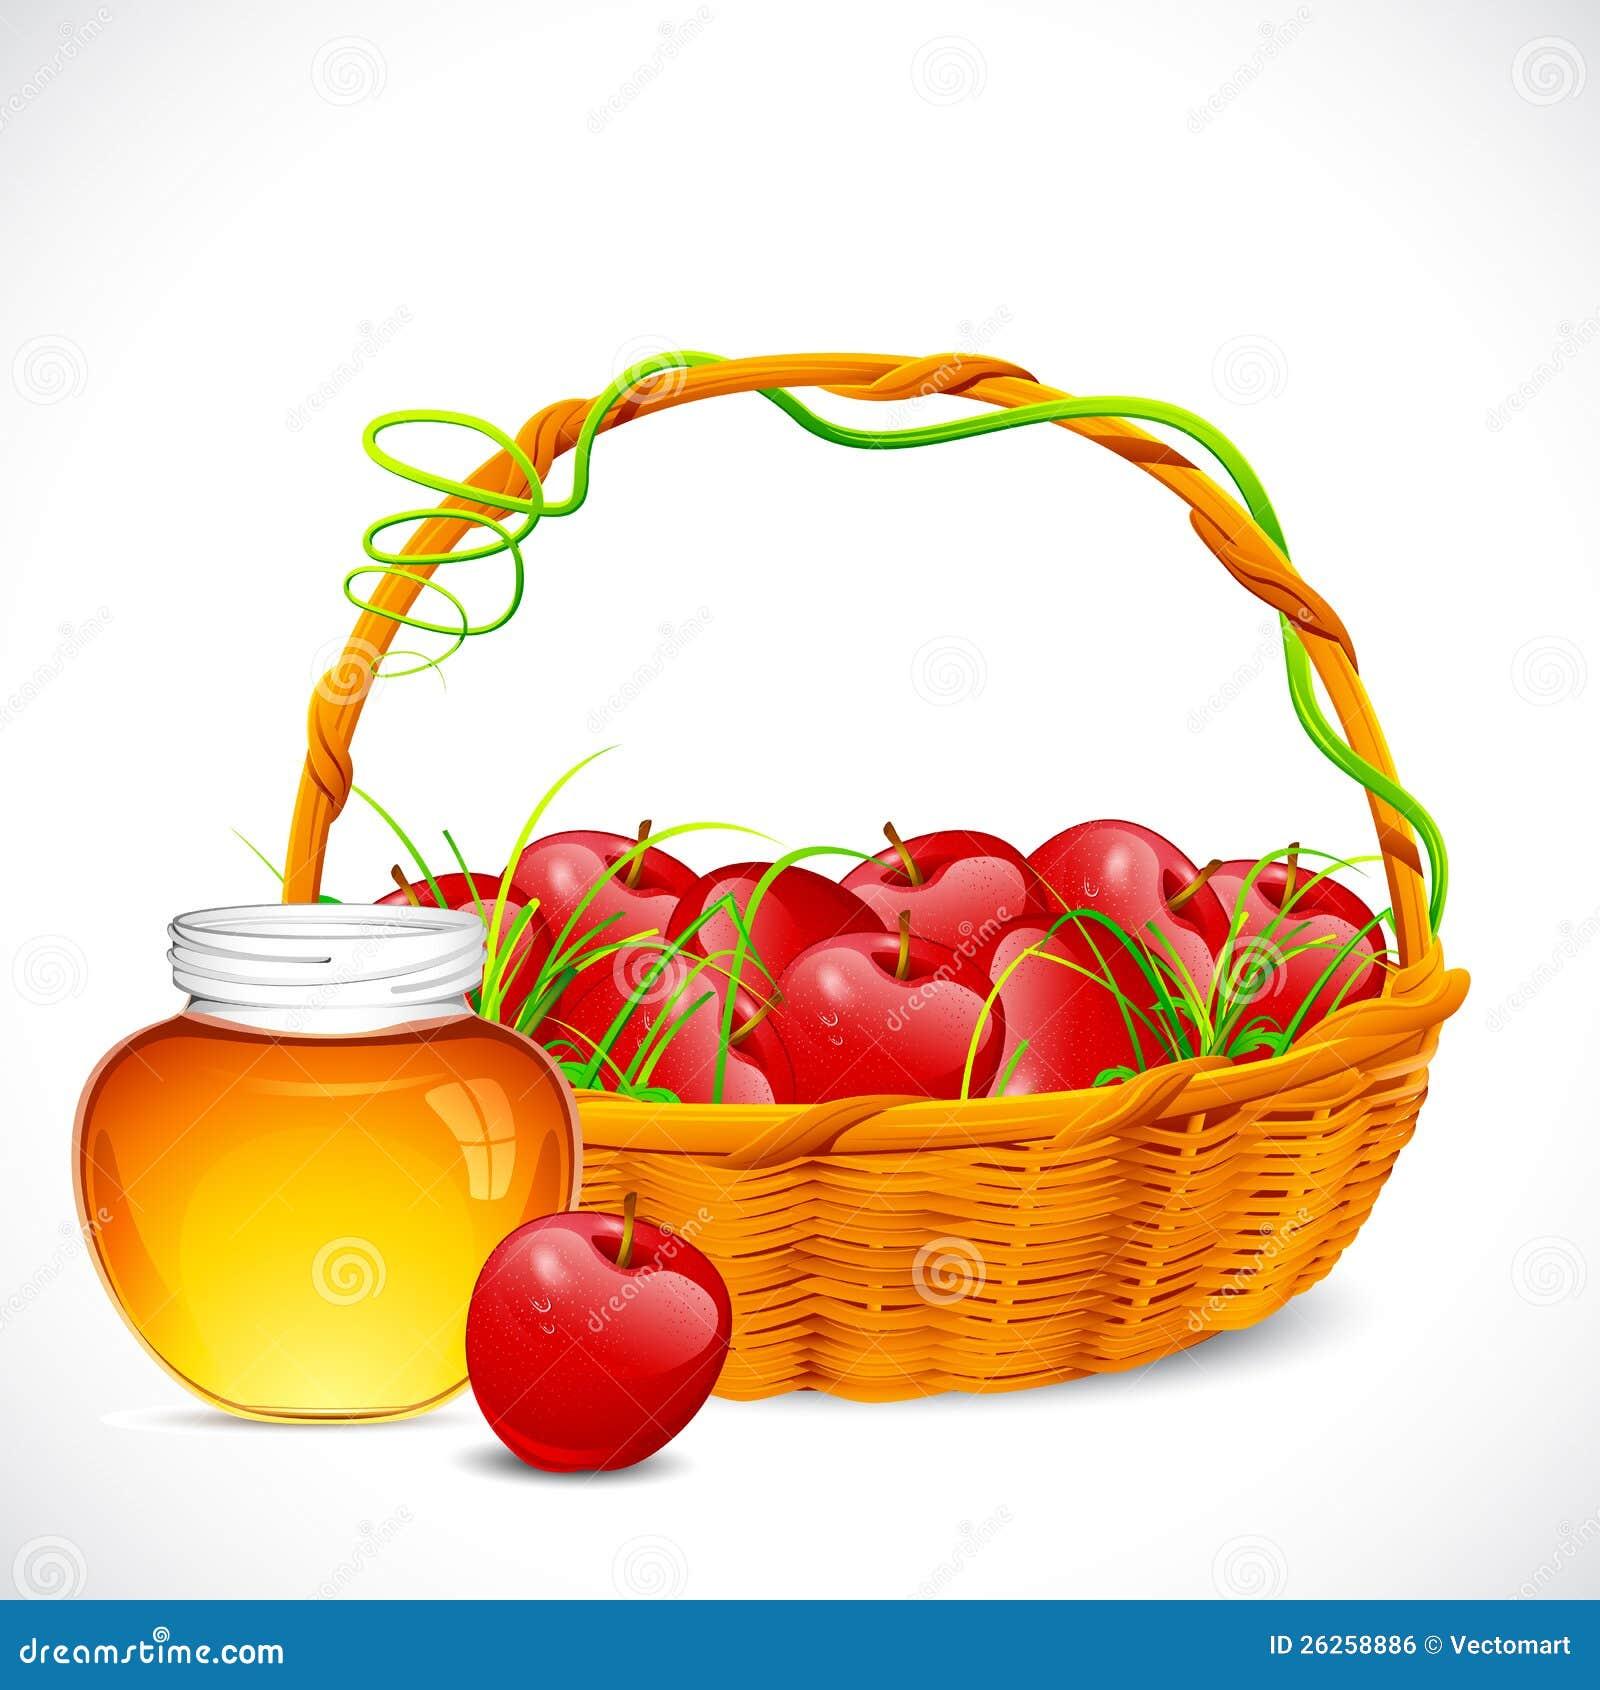 Honey Pot Images Stock Photos amp Vectors  Shutterstock